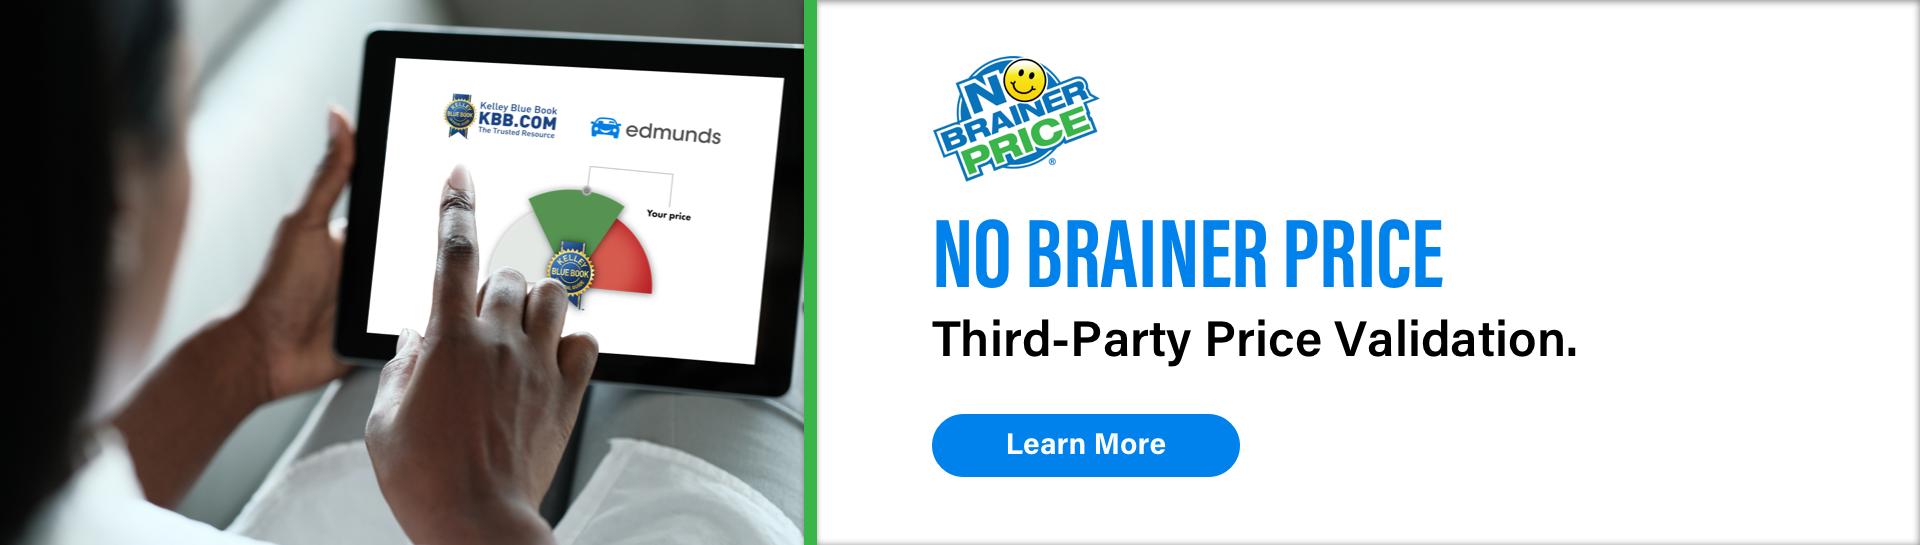 No Brainer Price 1920×545